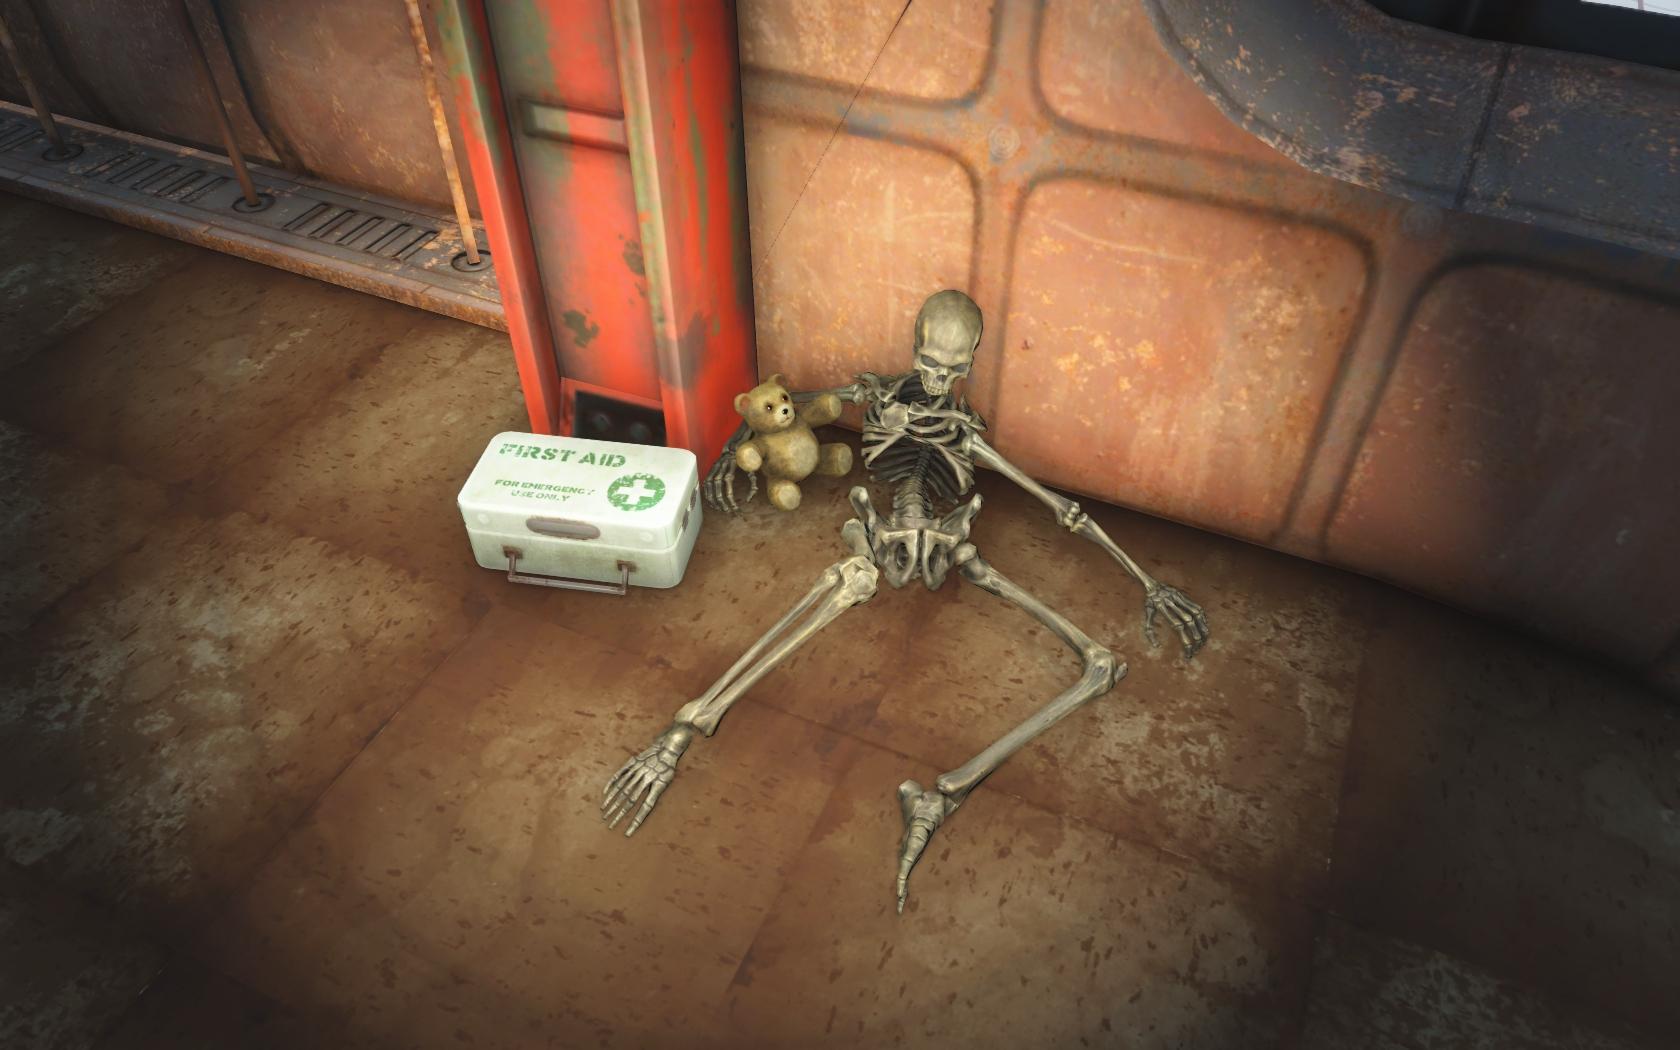 Последний утешитель (крыша здания у Фанер-Холл) - Fallout 4 скелет, Фанер-Холл, Юмор